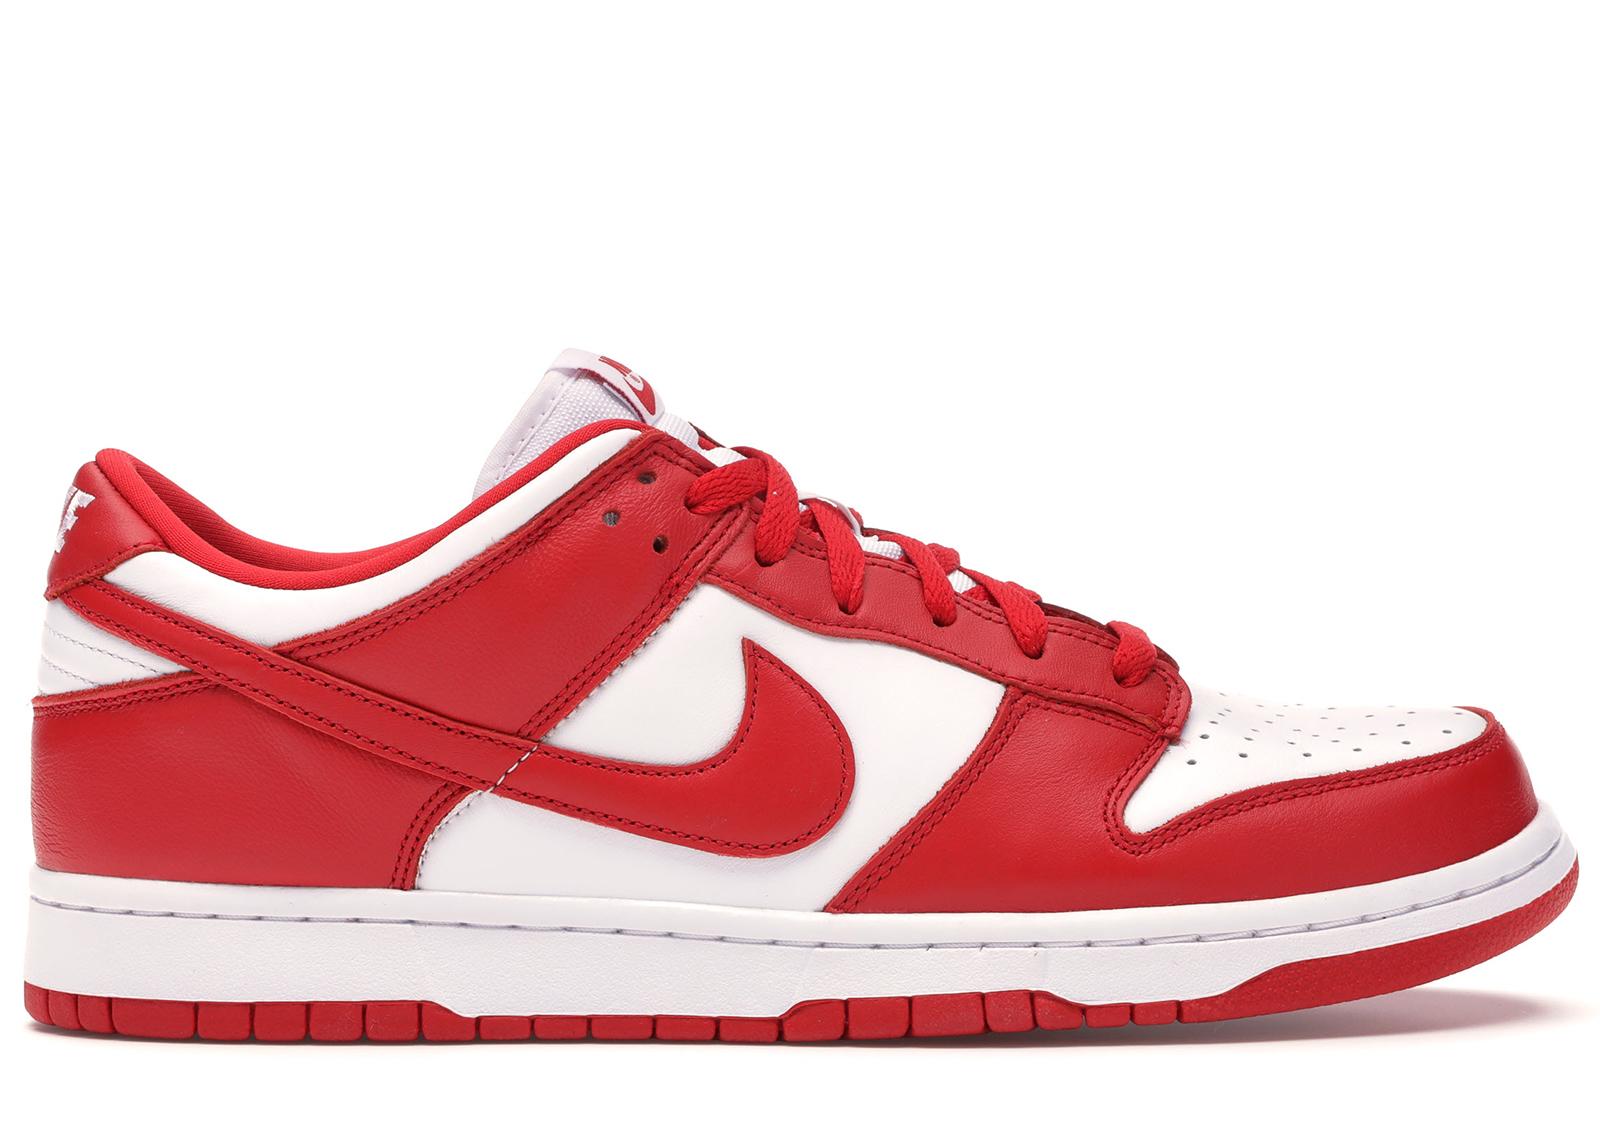 Nike Dunk Low University Red (2020